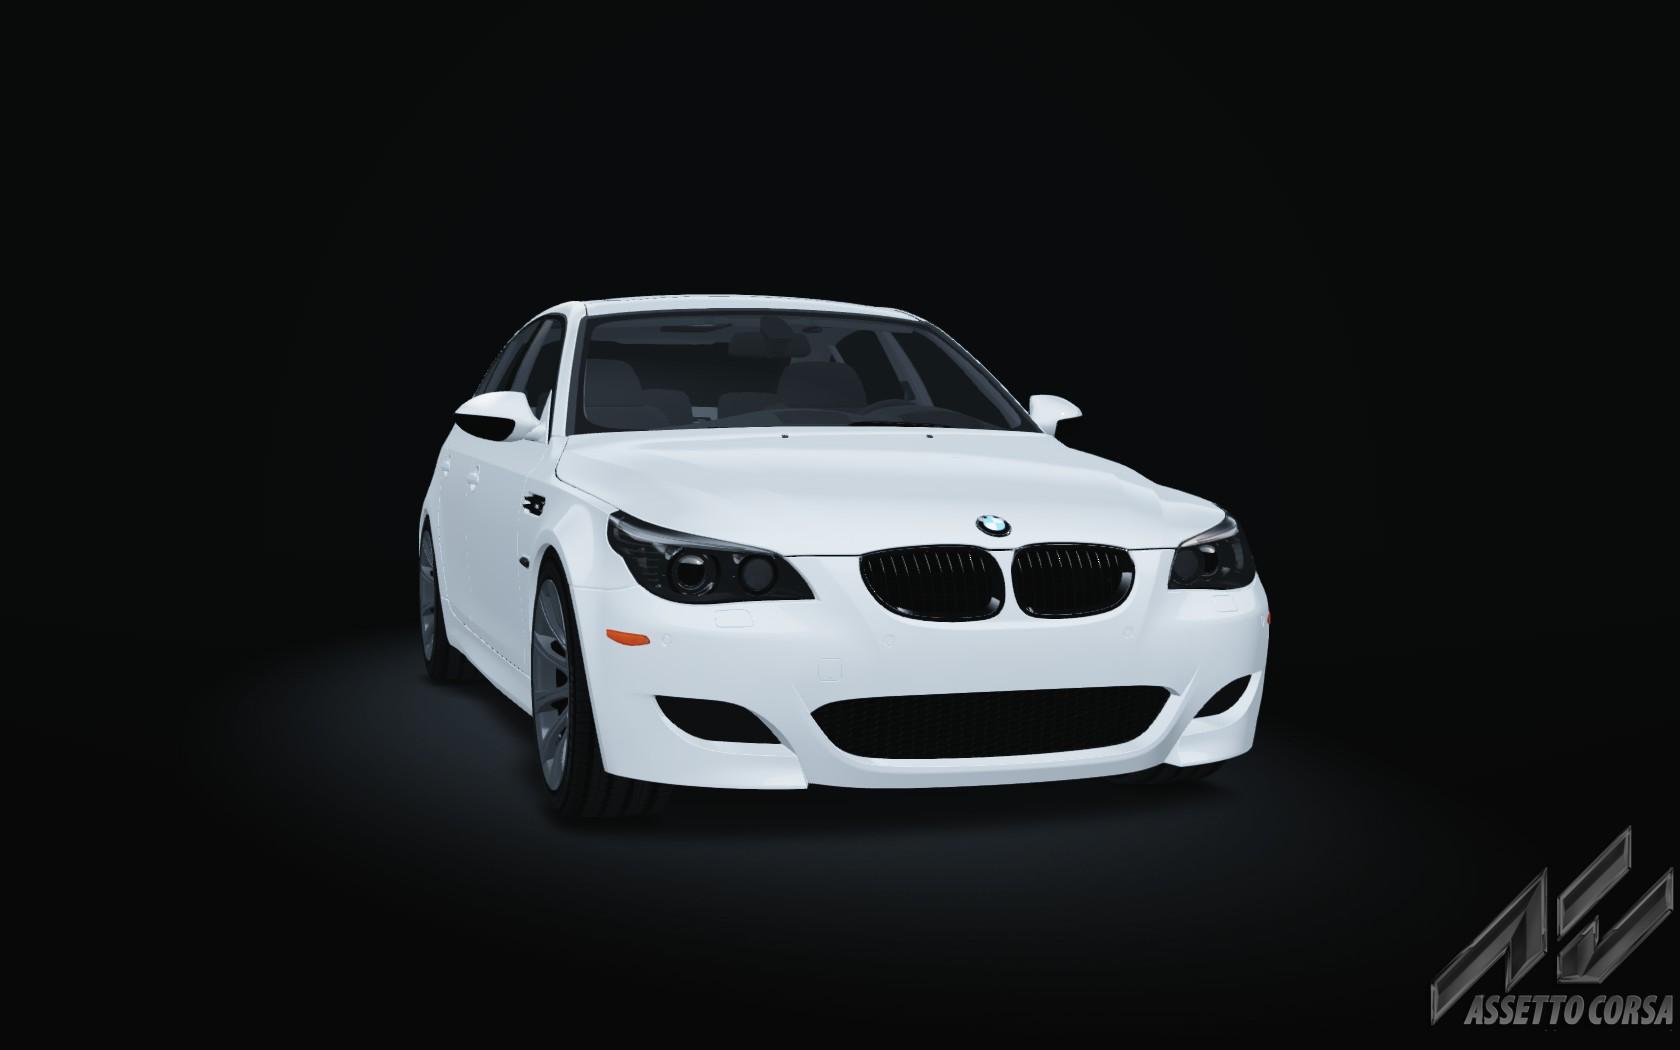 Assetto Corsa BMW M5 E60